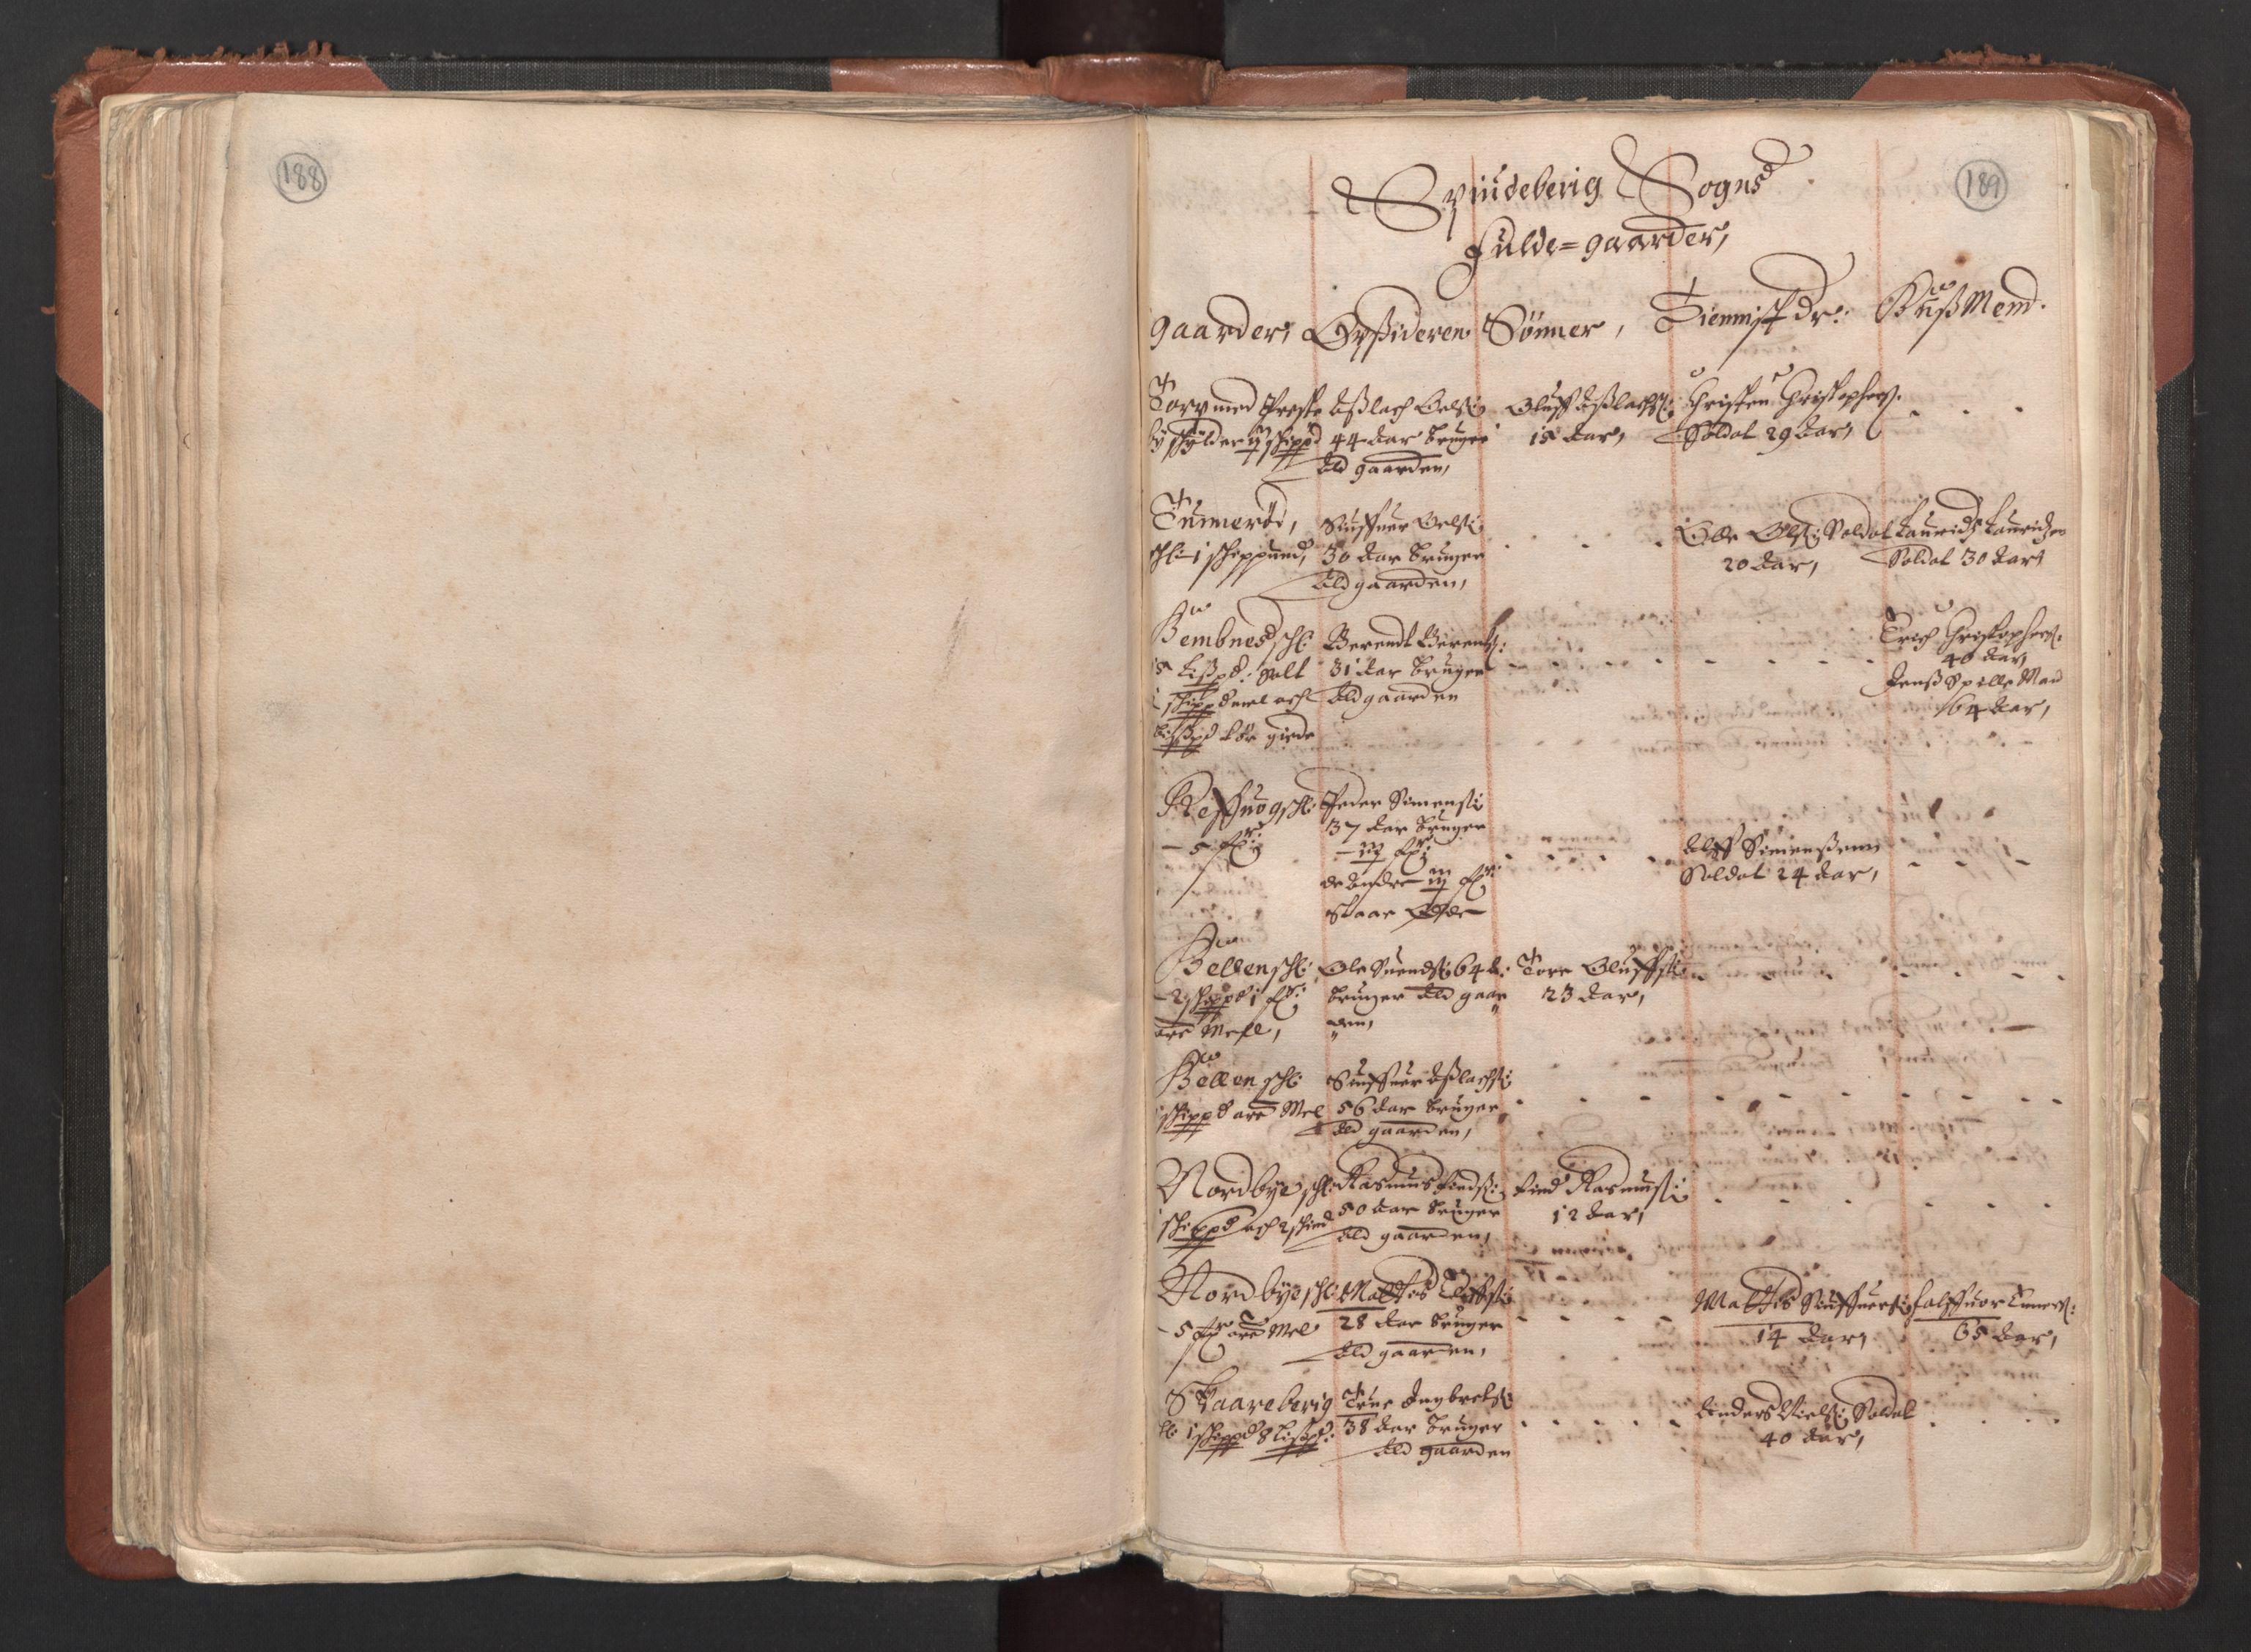 RA, Fogdenes og sorenskrivernes manntall 1664-1666, nr. 1: Fogderier (len og skipreider) i nåværende Østfold fylke, 1664, s. 188-189